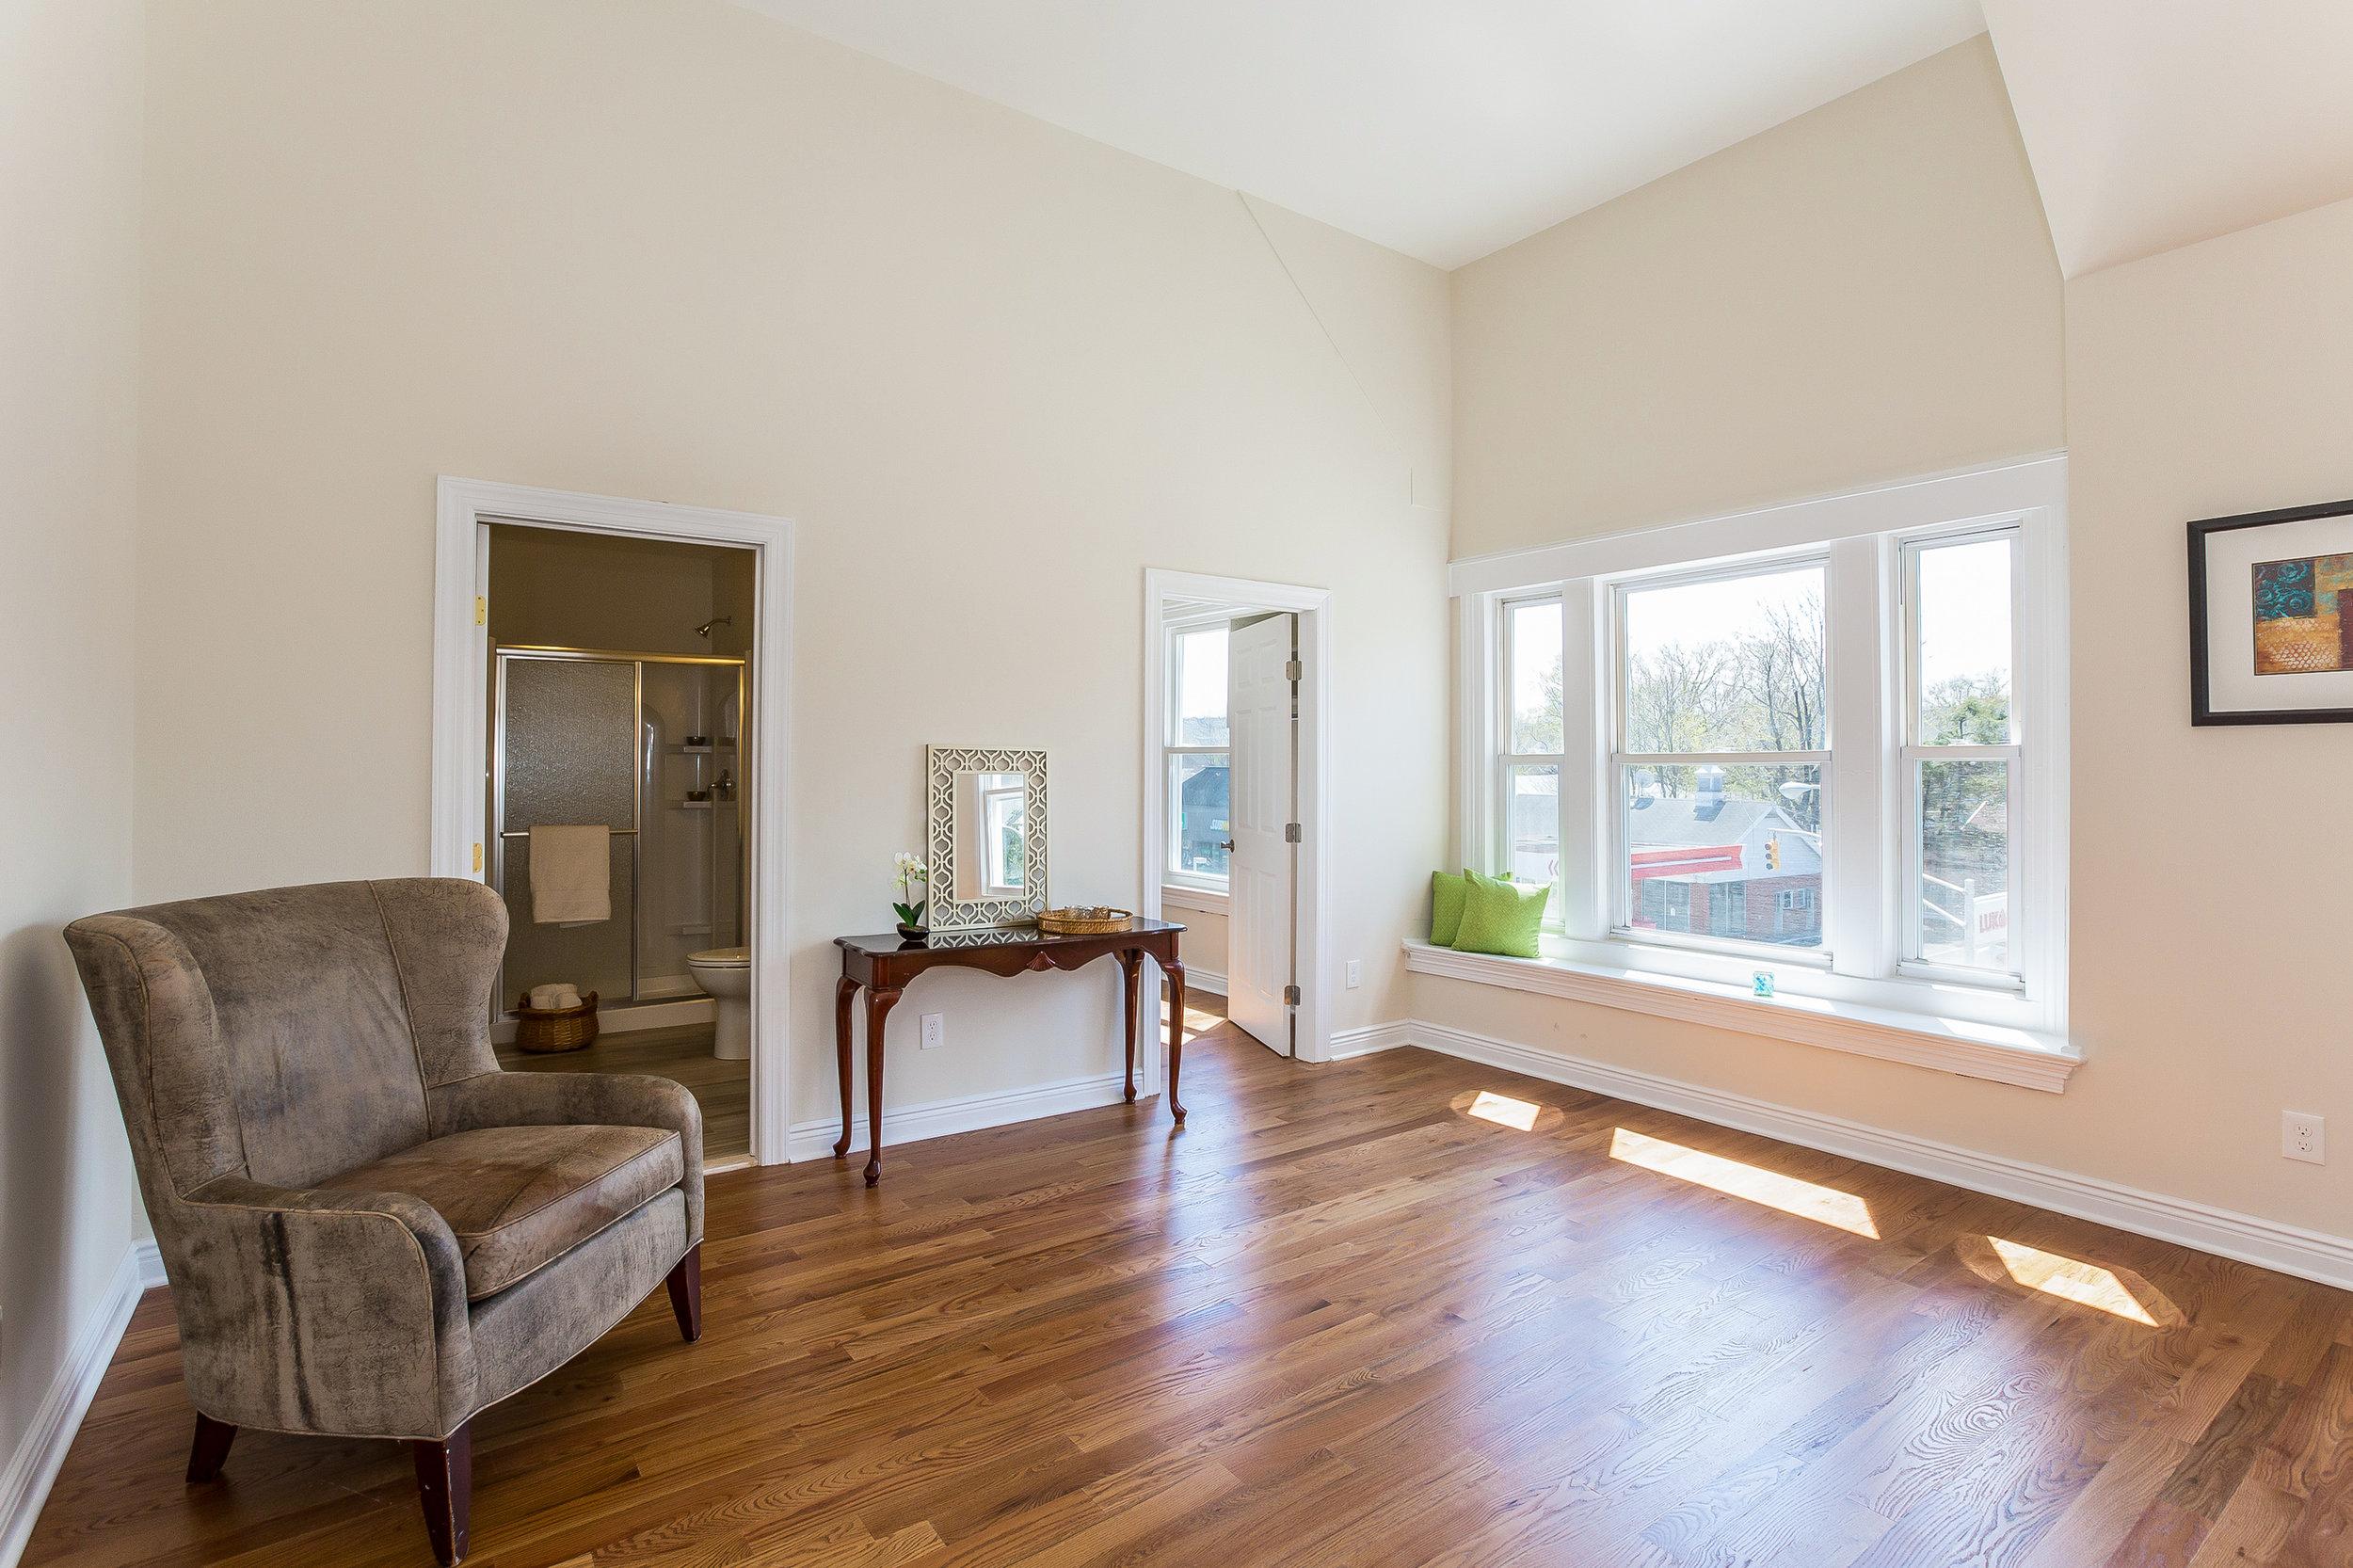 046-Master_Bedroom-3992656-large.jpg